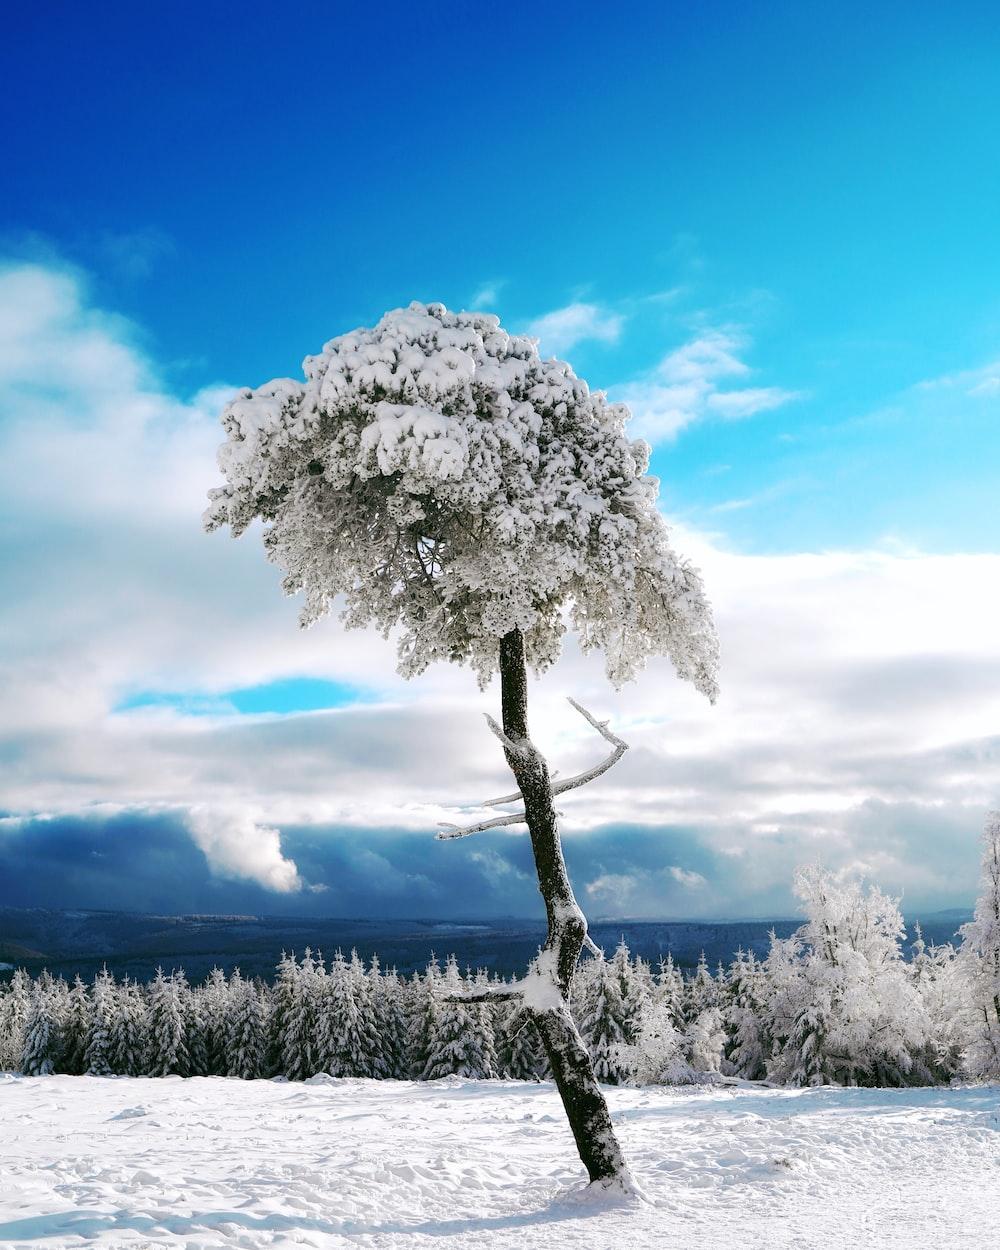 white tree under blue sky during daytime